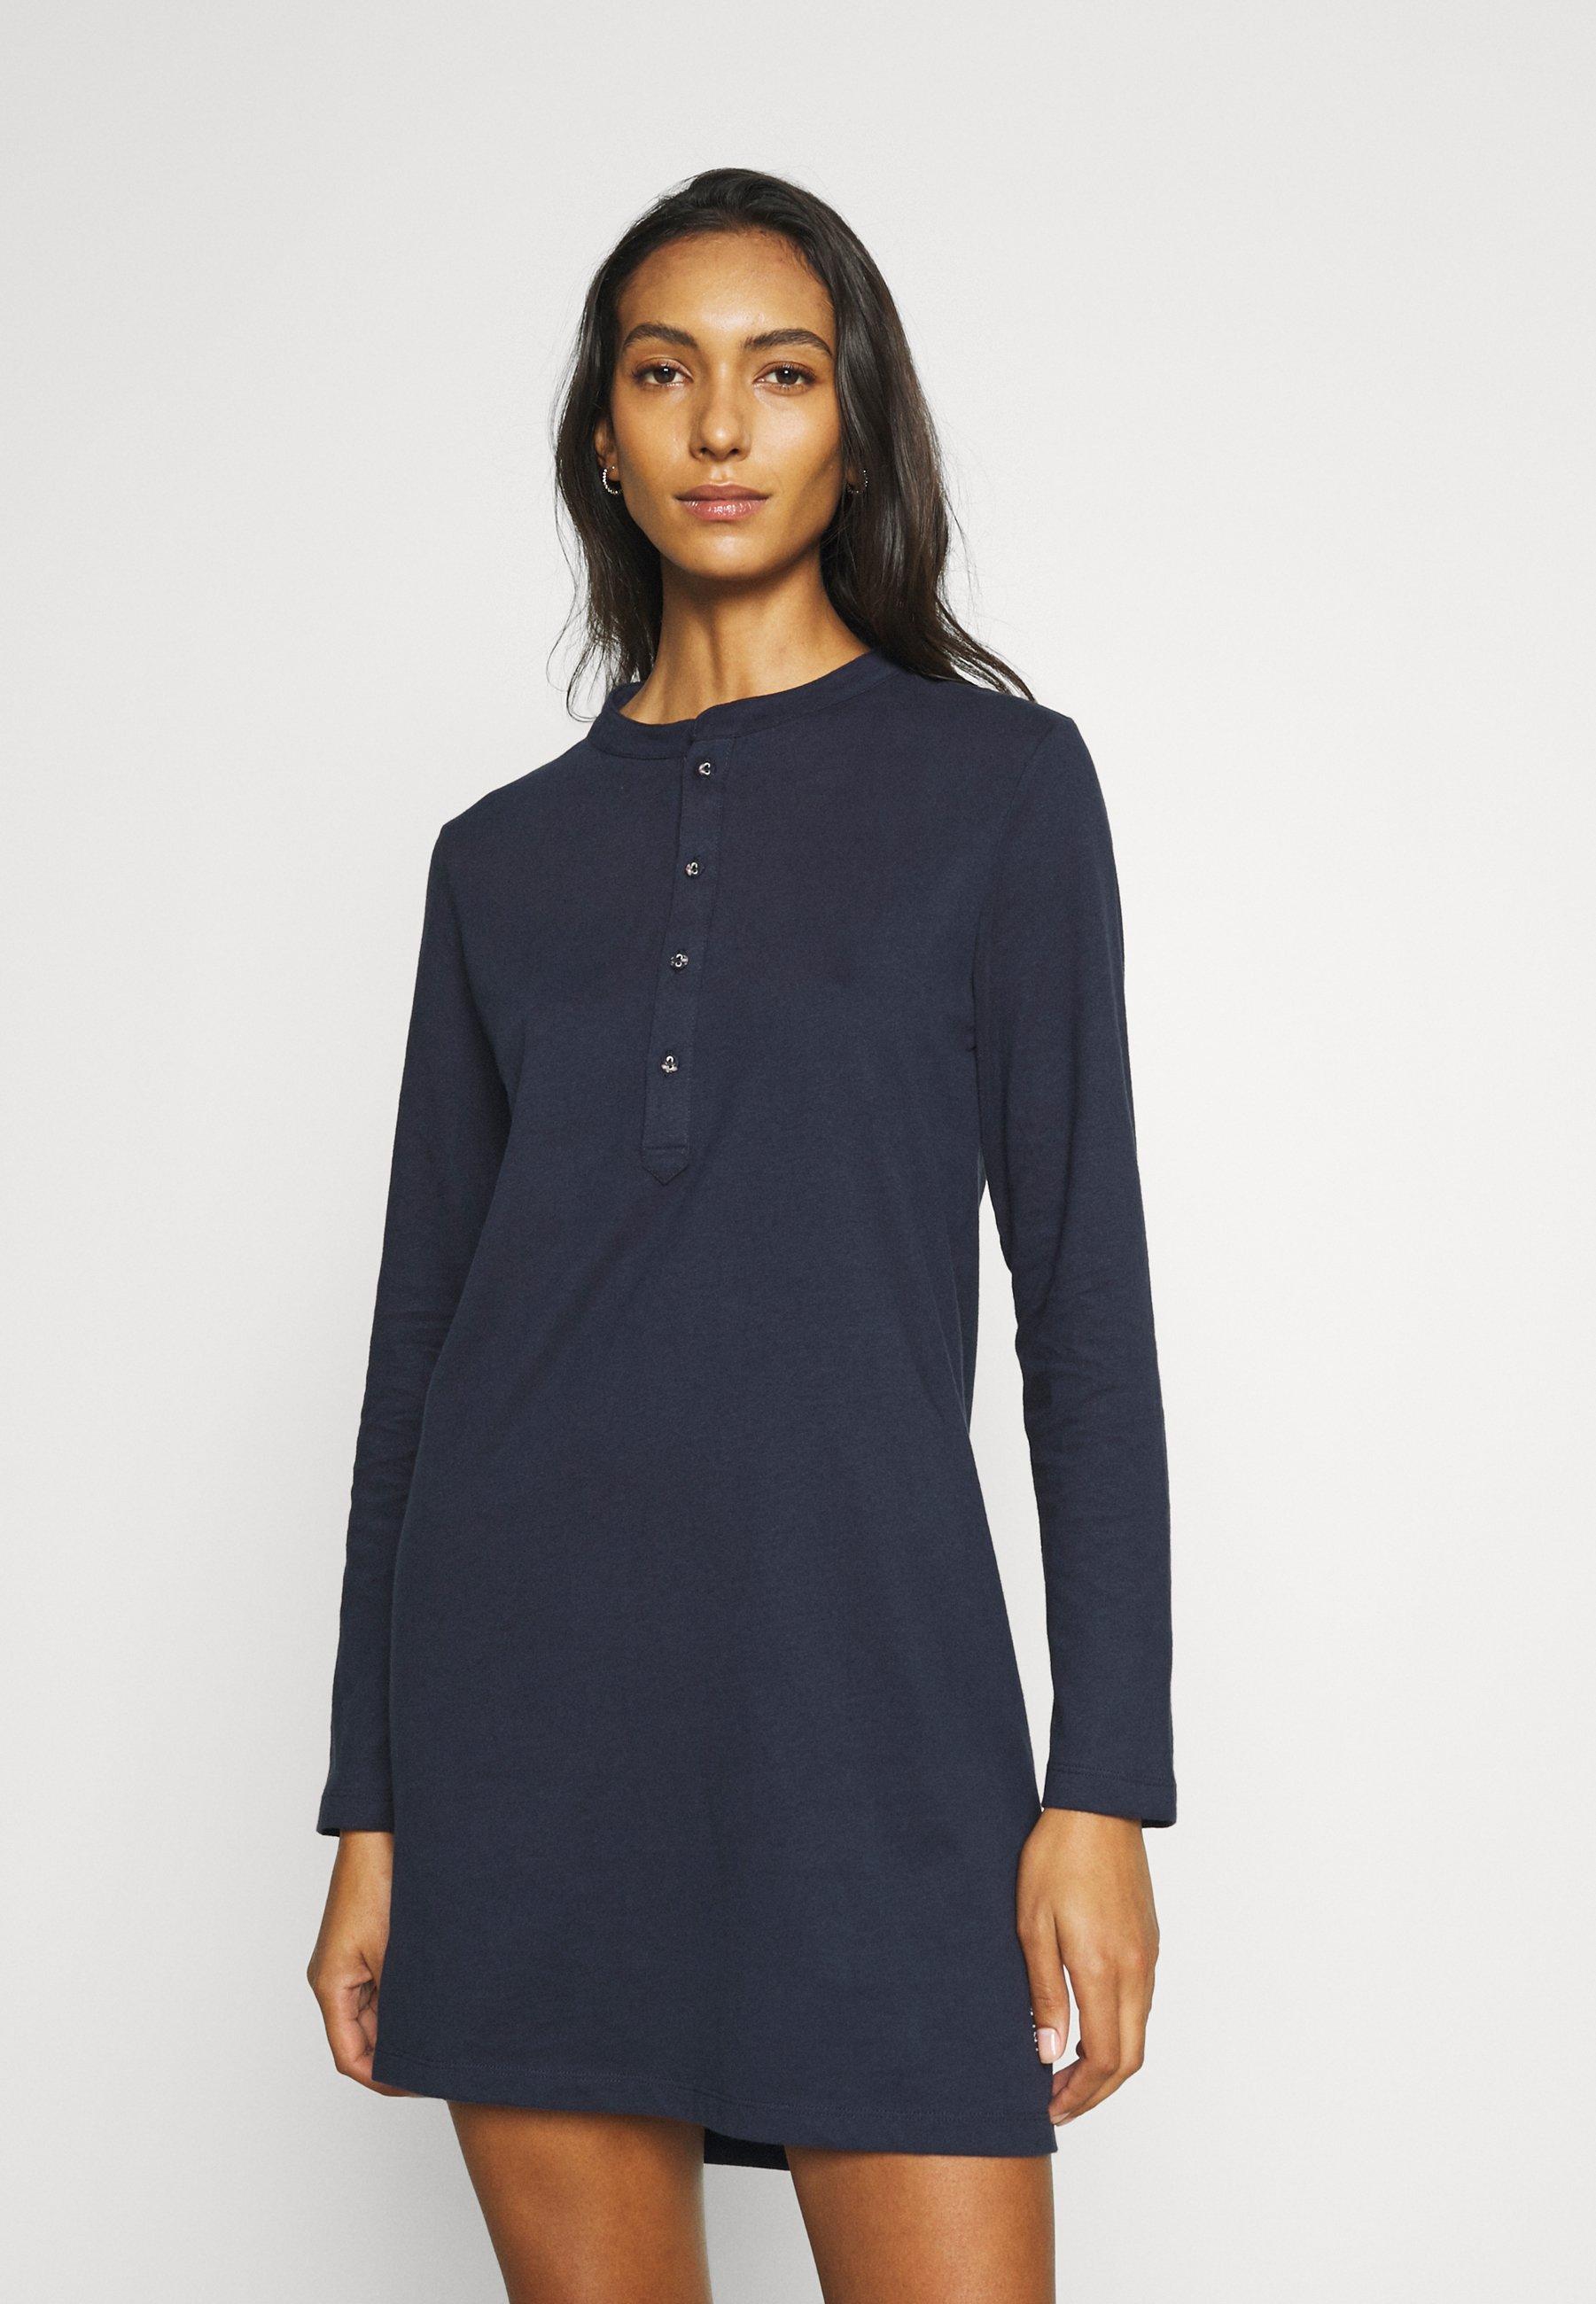 Donna NIGHTSHIRT SOLID - Camicia da notte